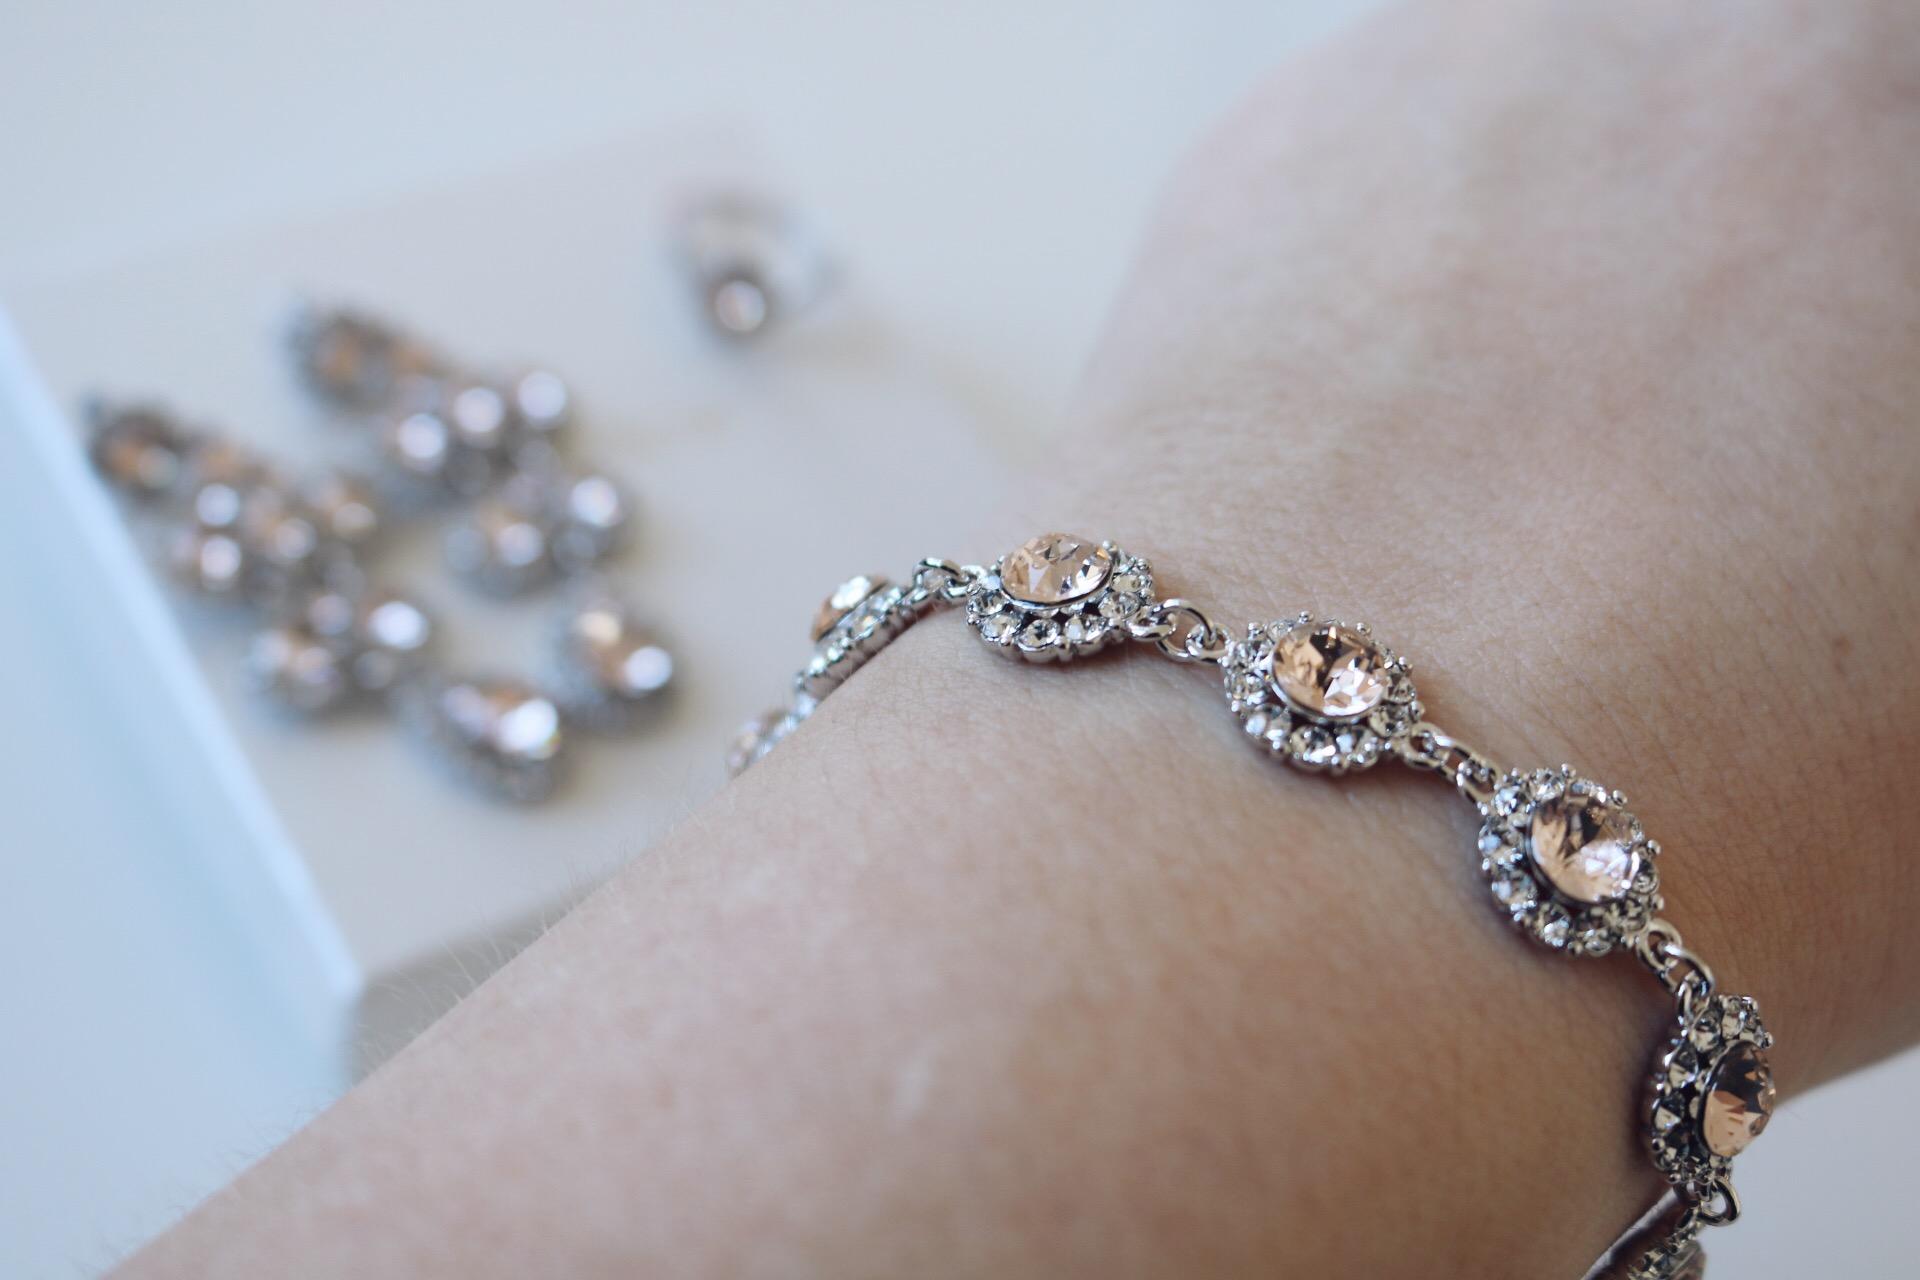 Lily and Rose smycken armband skönhetsblogg silk